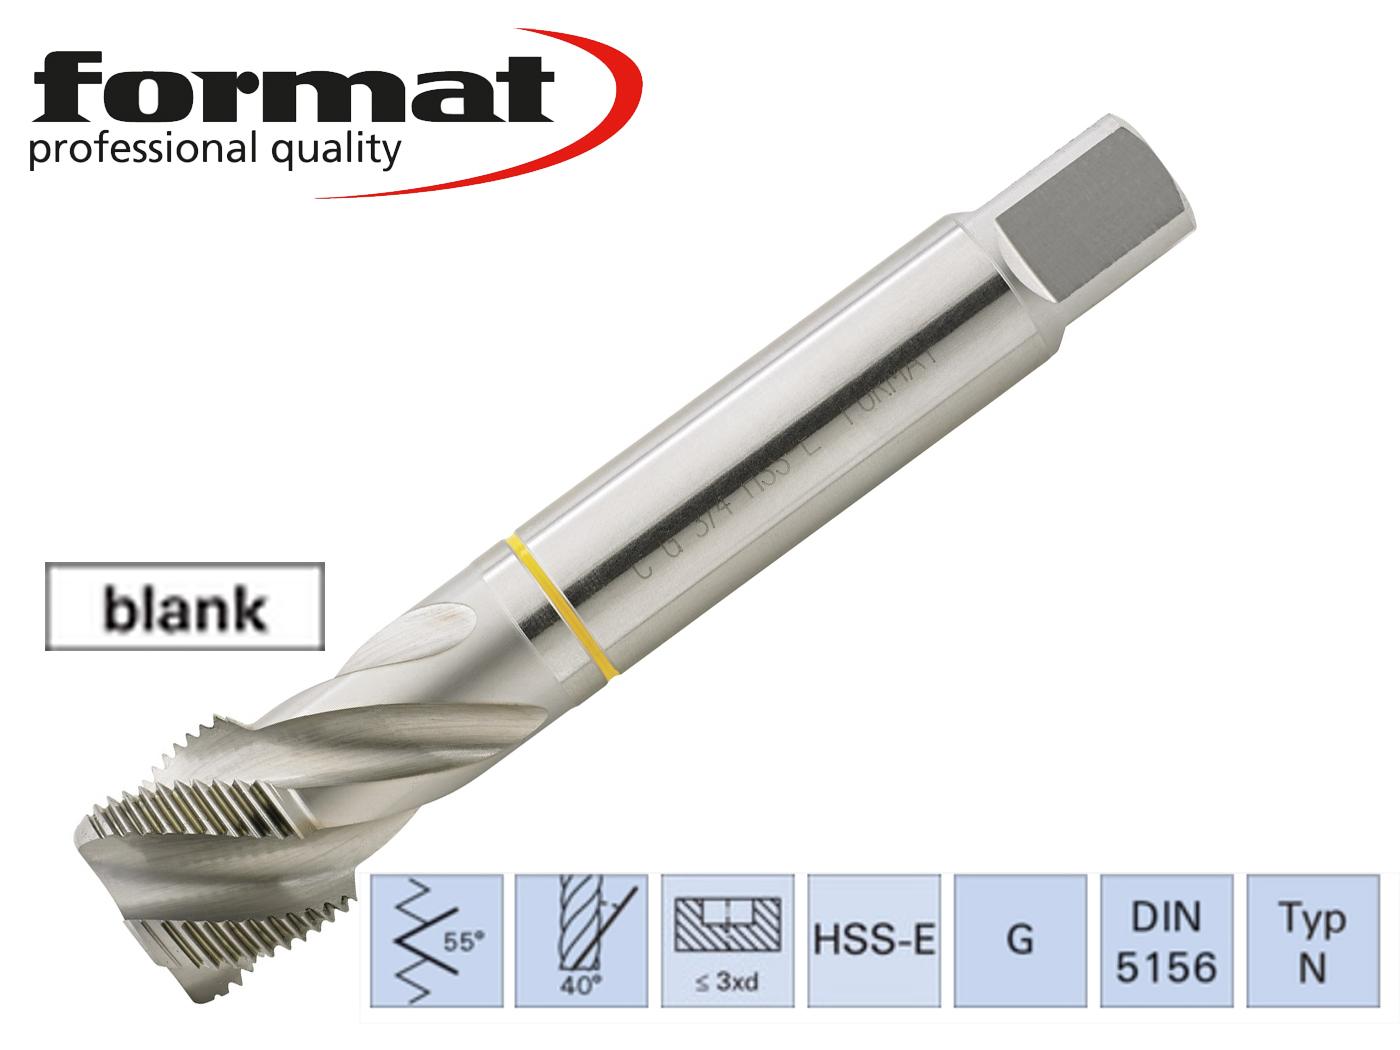 Machinetappen G DIN 5156. C HSSE Co 5 geslepen   DKMTools - DKM Tools